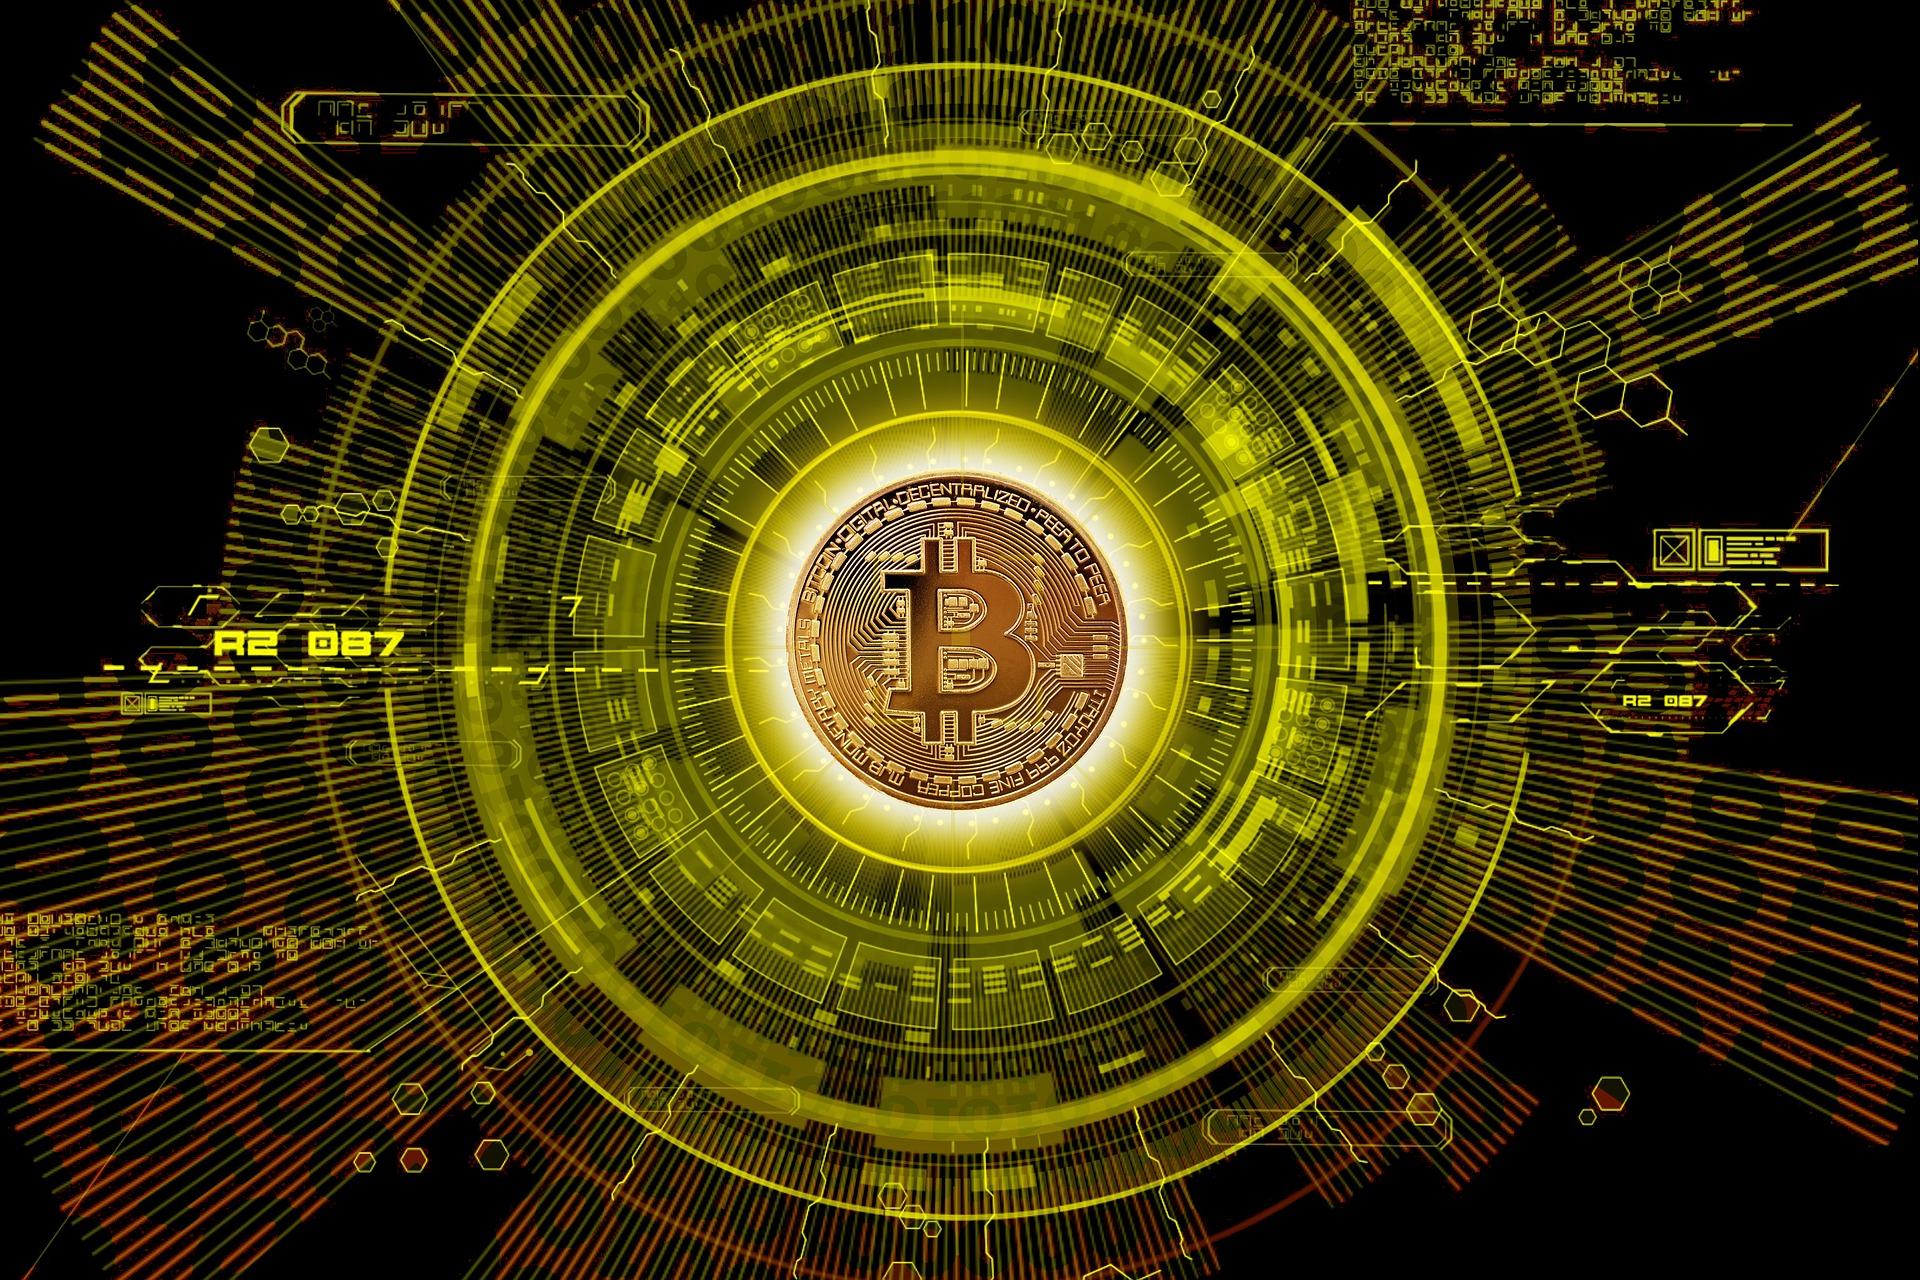 Over 100K users now use Bitcoin IRA platform